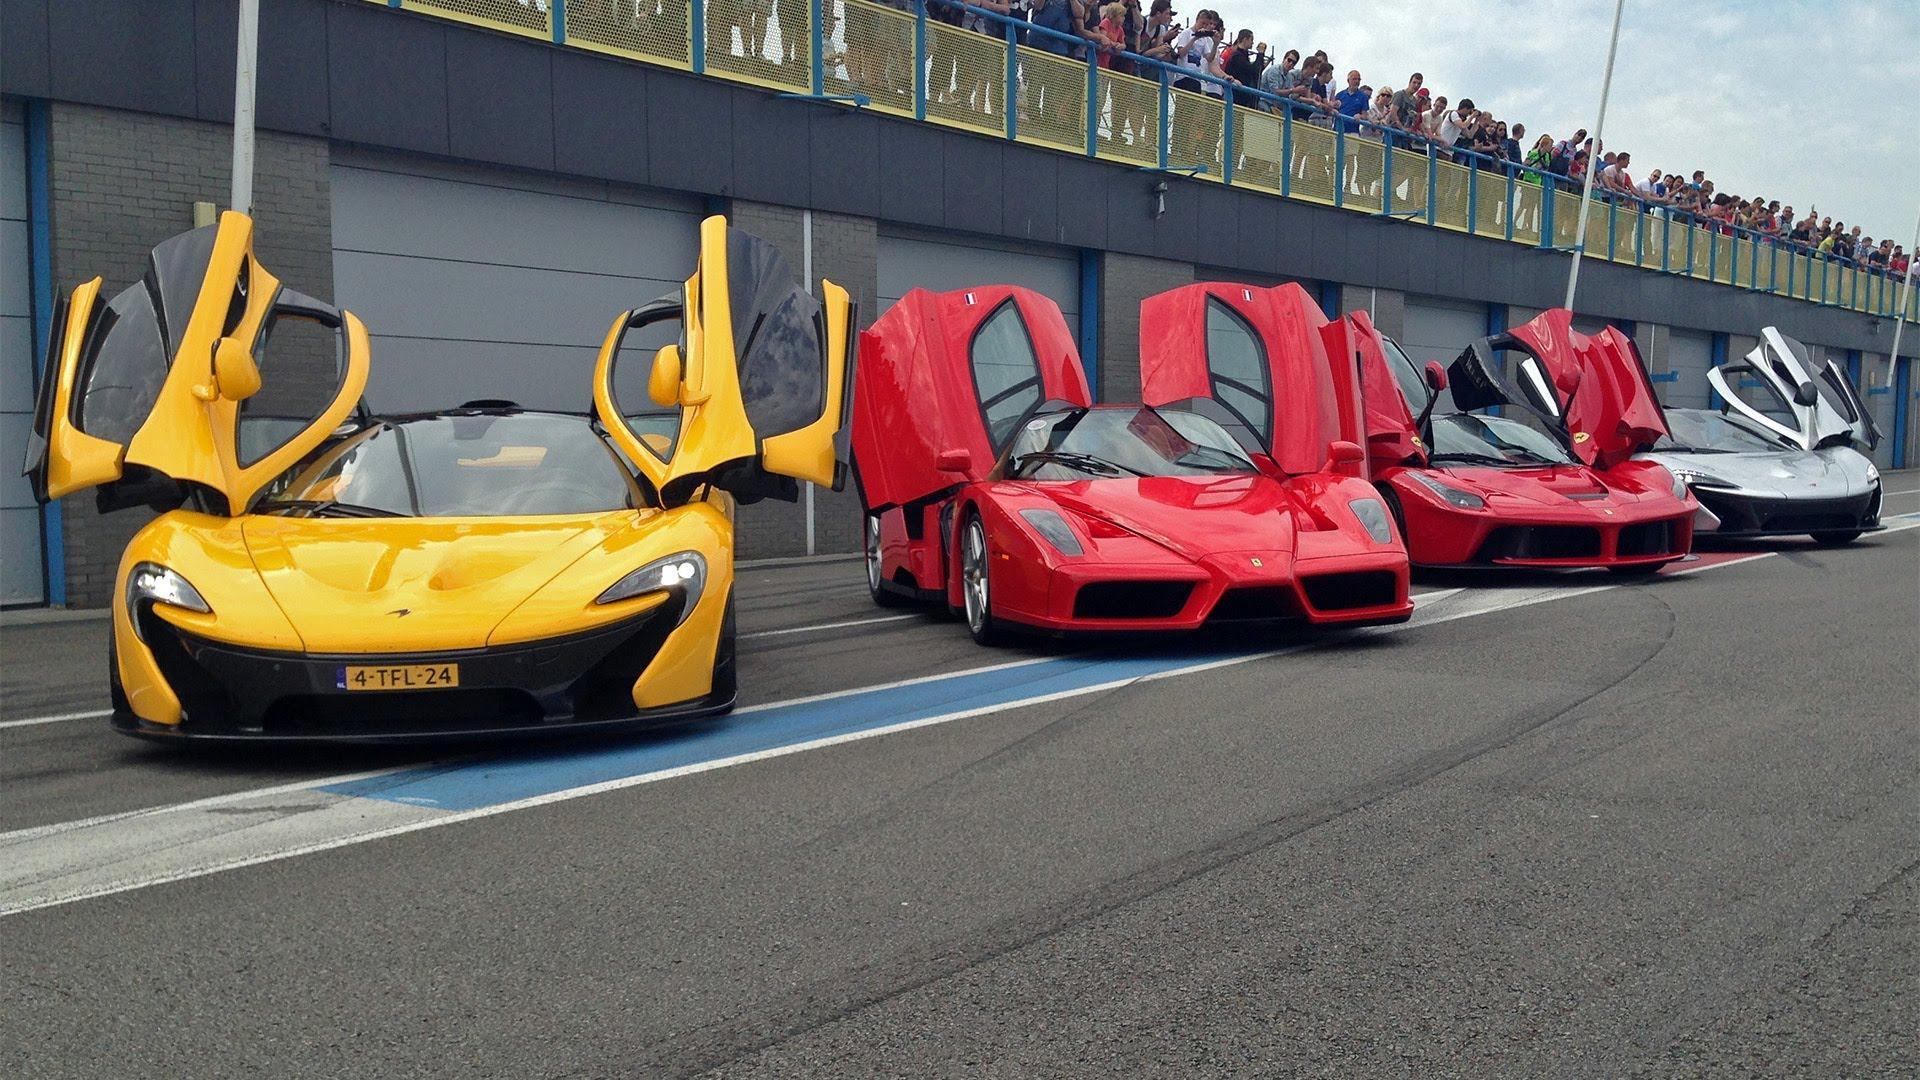 INSANE Hypercar Line-up: P1, LaFerrari, 918 Spyder, Enzo, Carrera